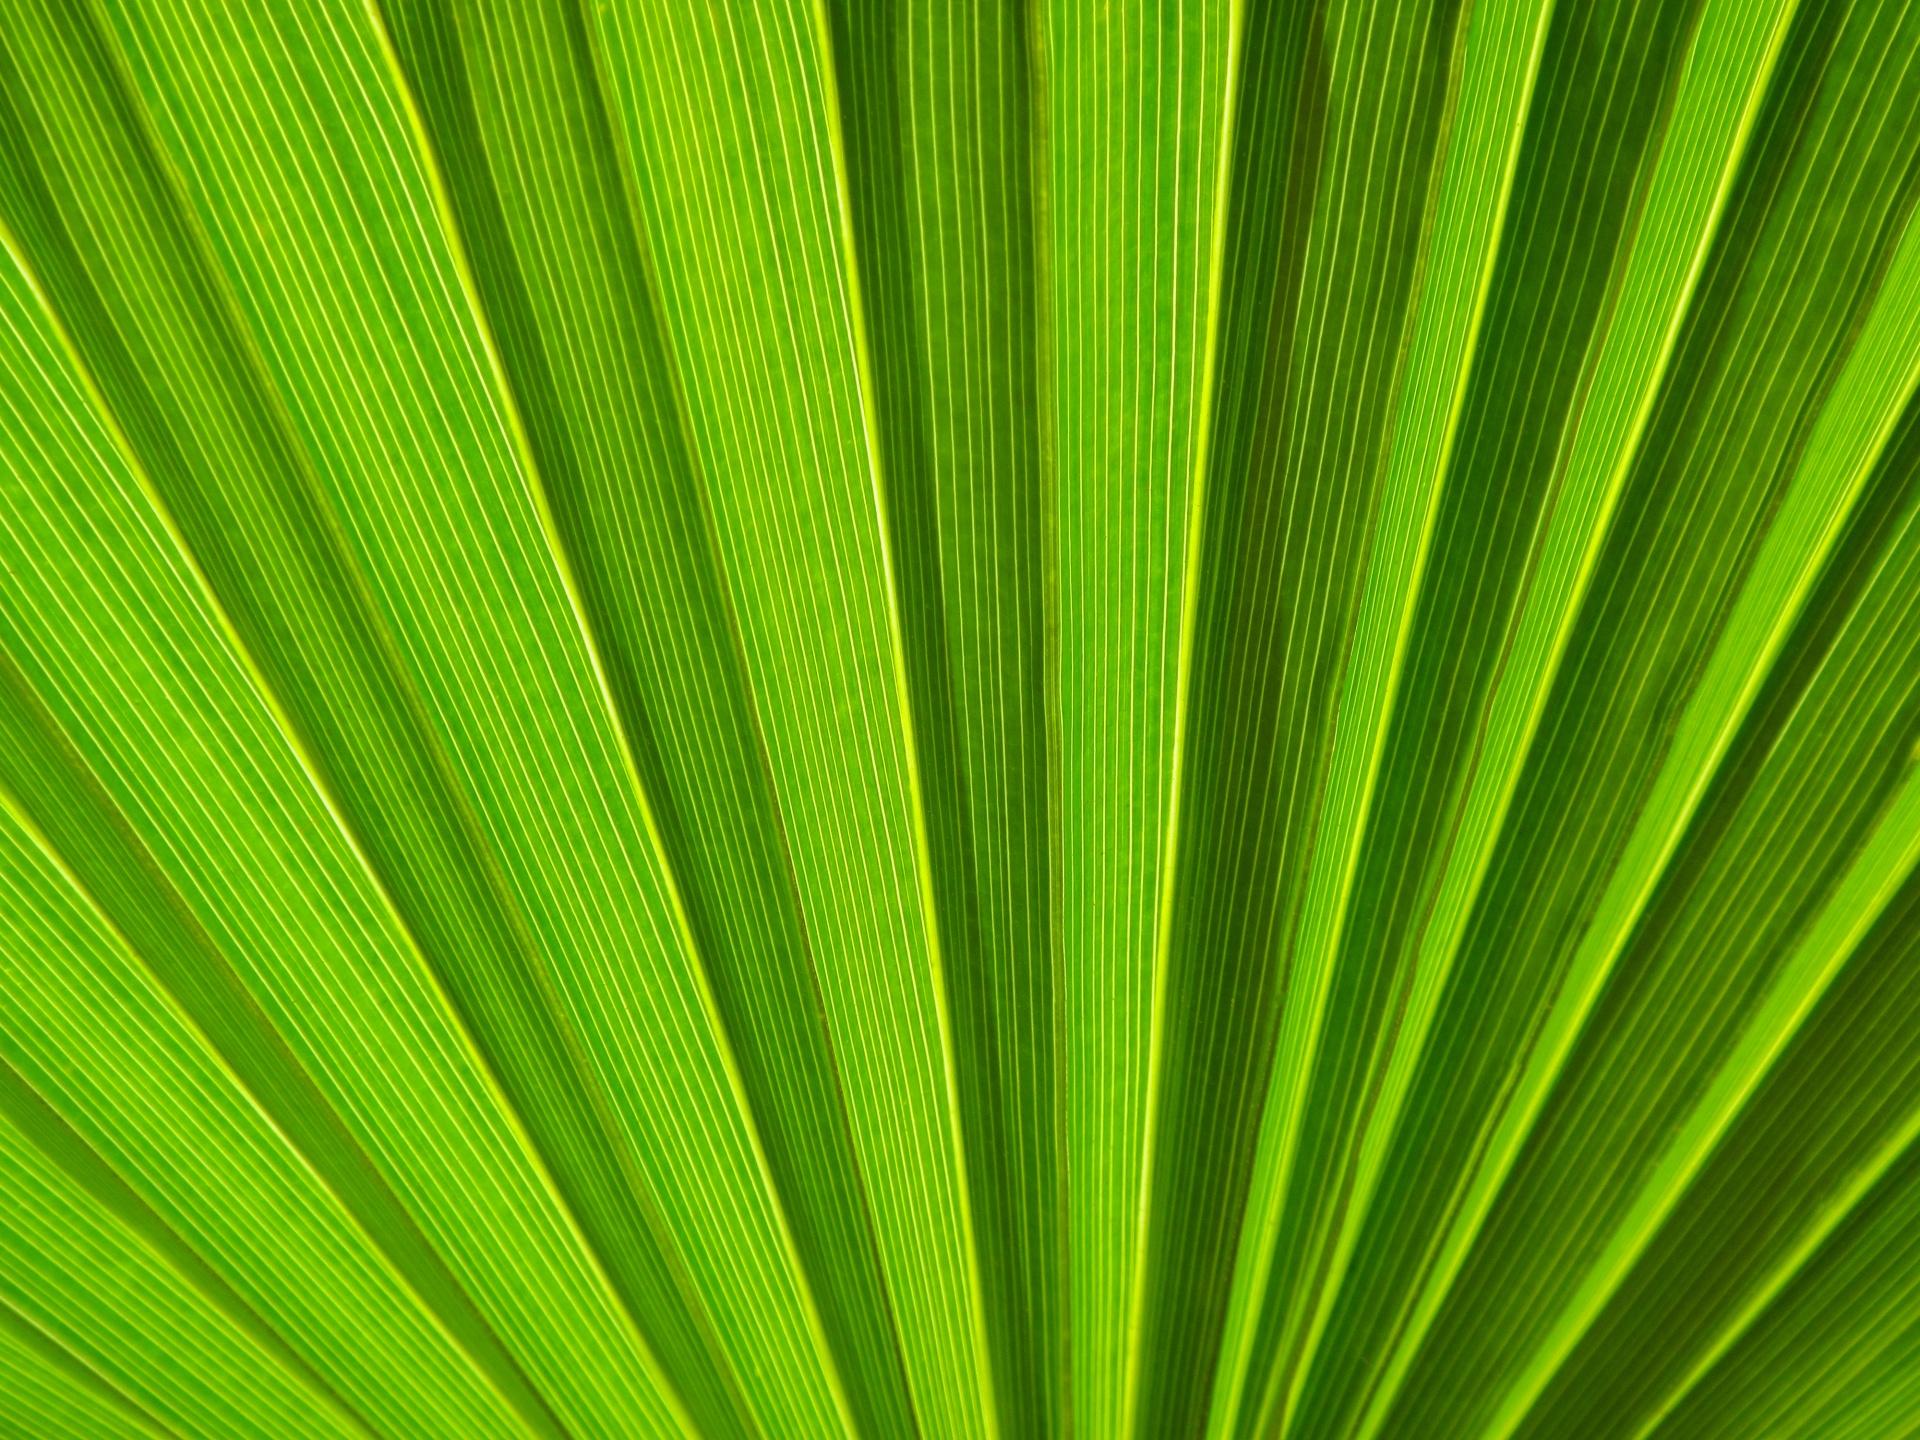 green-palm-leaf-detail-1442738025m1i.jpg